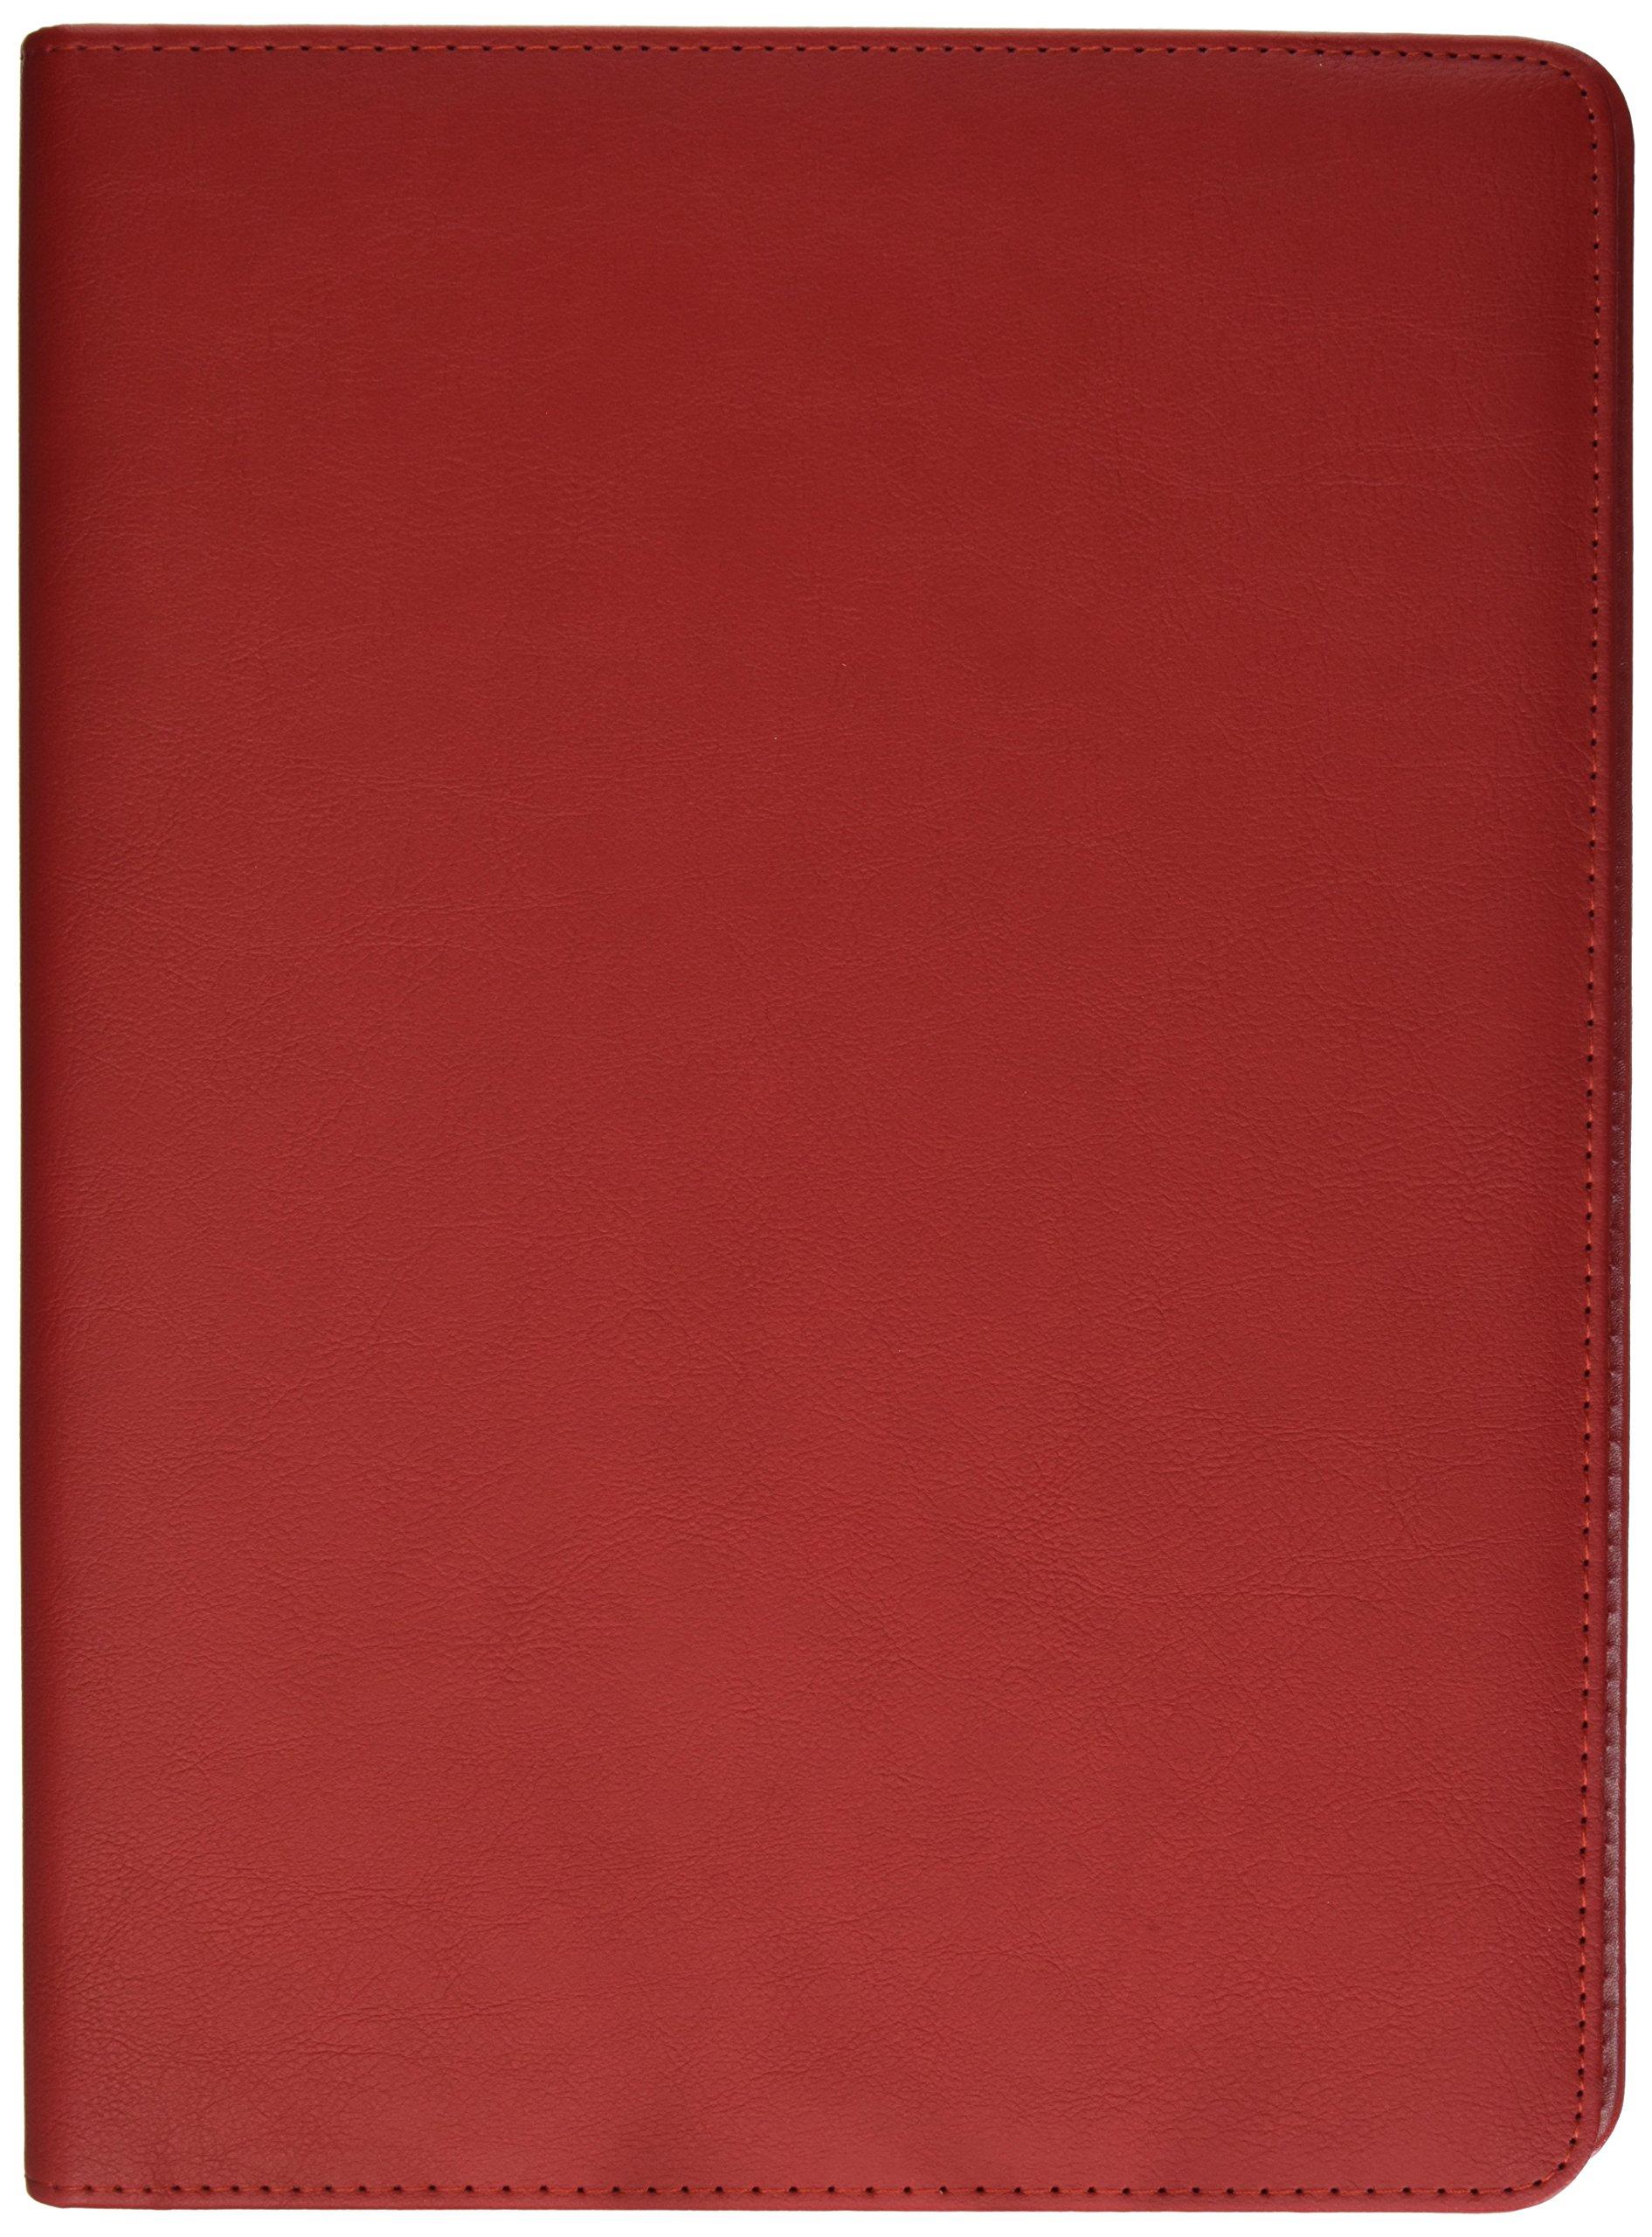 Buyinhouse Professional Office/Business Documents Folder Resume Binder Portfolio Organiser, Red